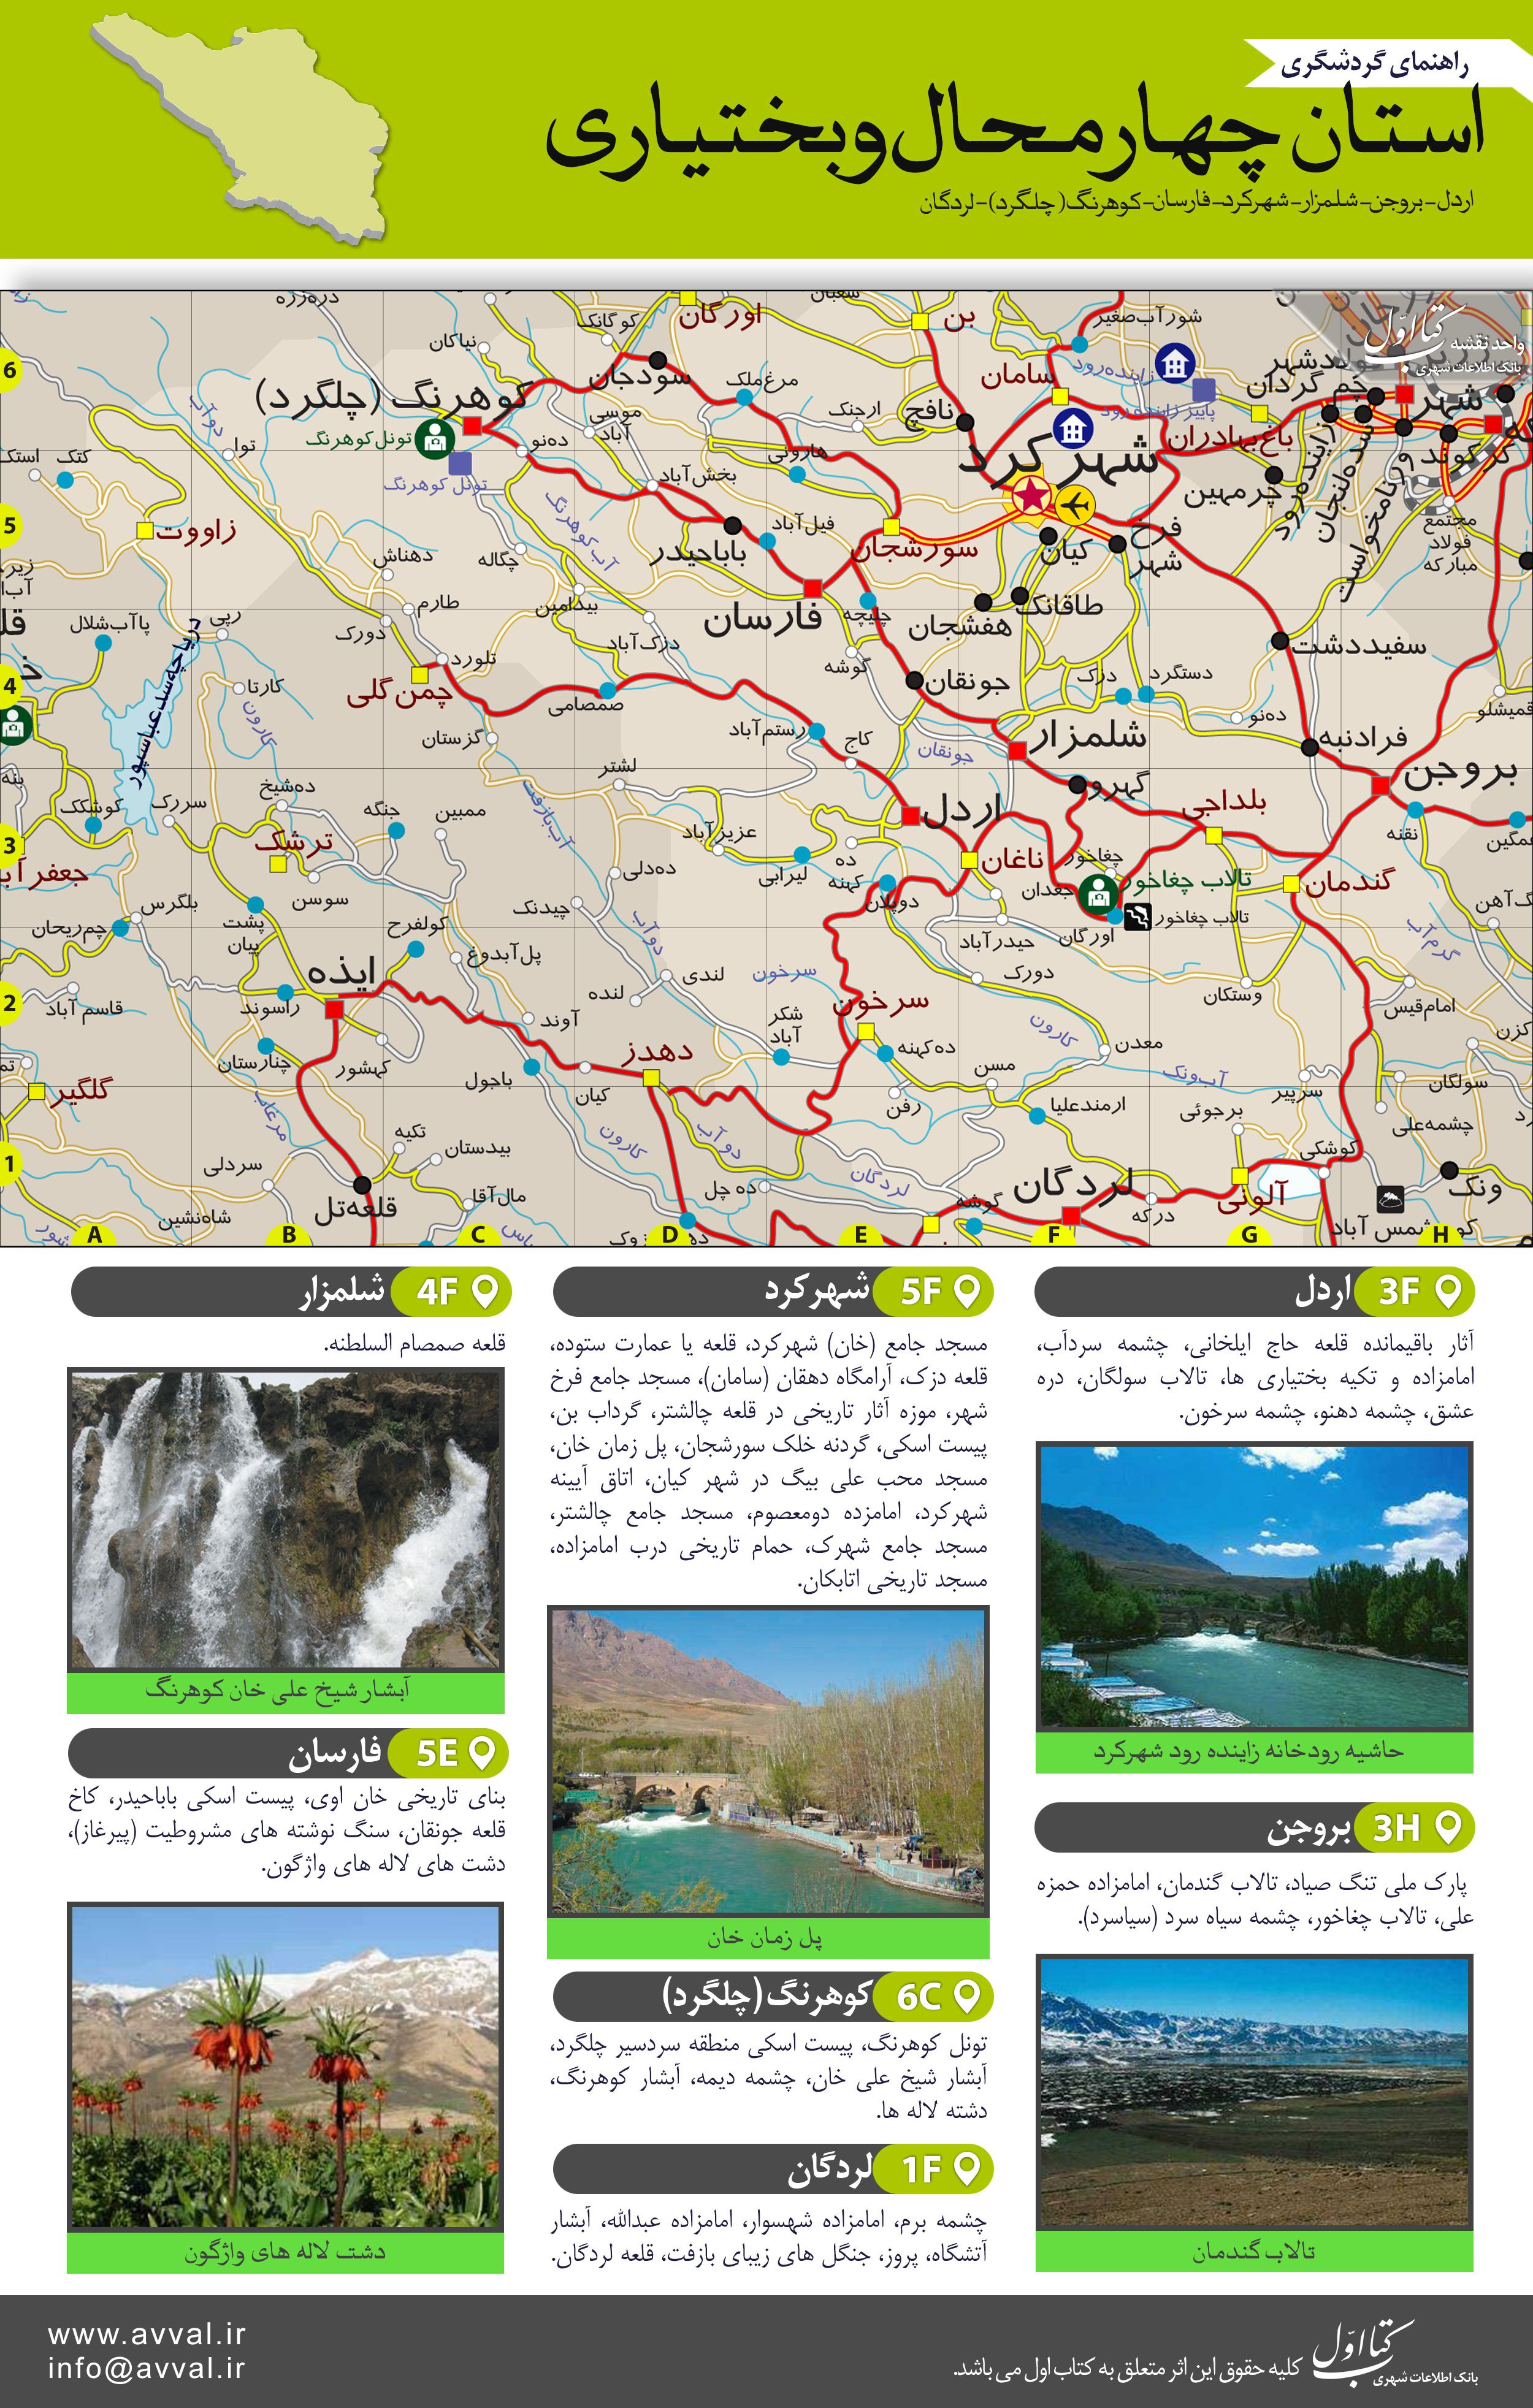 http://irantouring.com/uploaded_files/DCMS/wysiwyg/files/Chahar-mahal-o-bakhtiyari.jpg